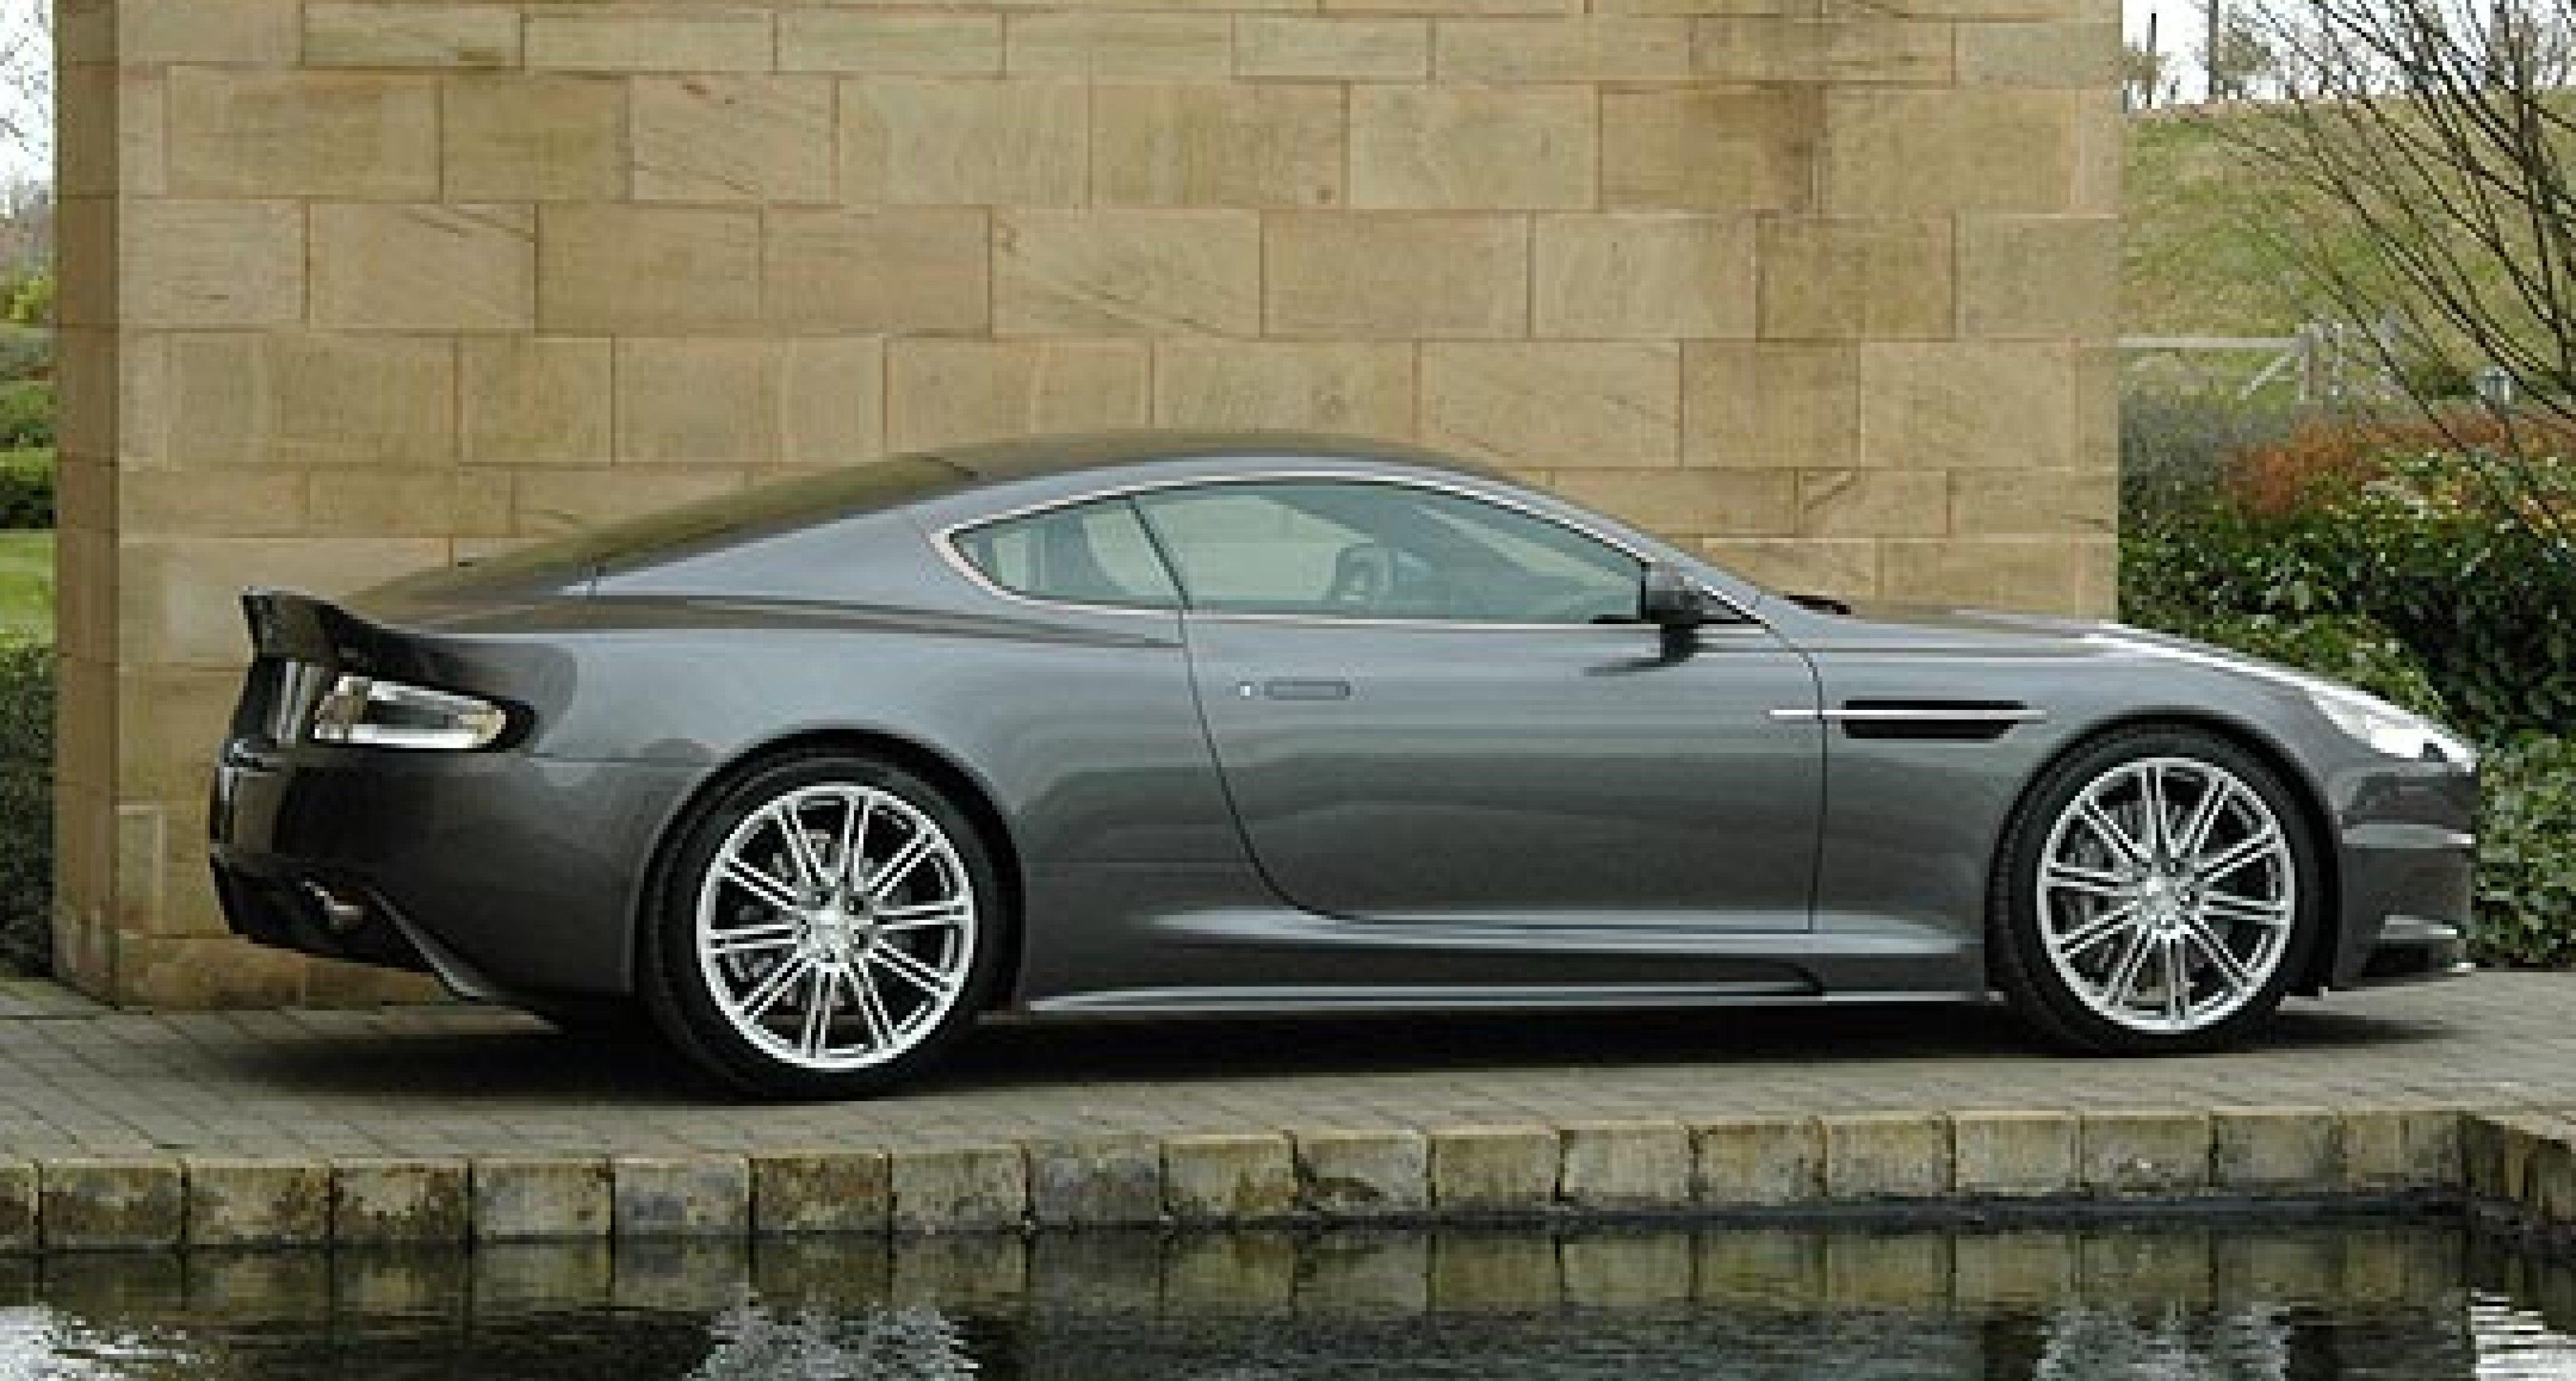 Ford sells Aston Martin